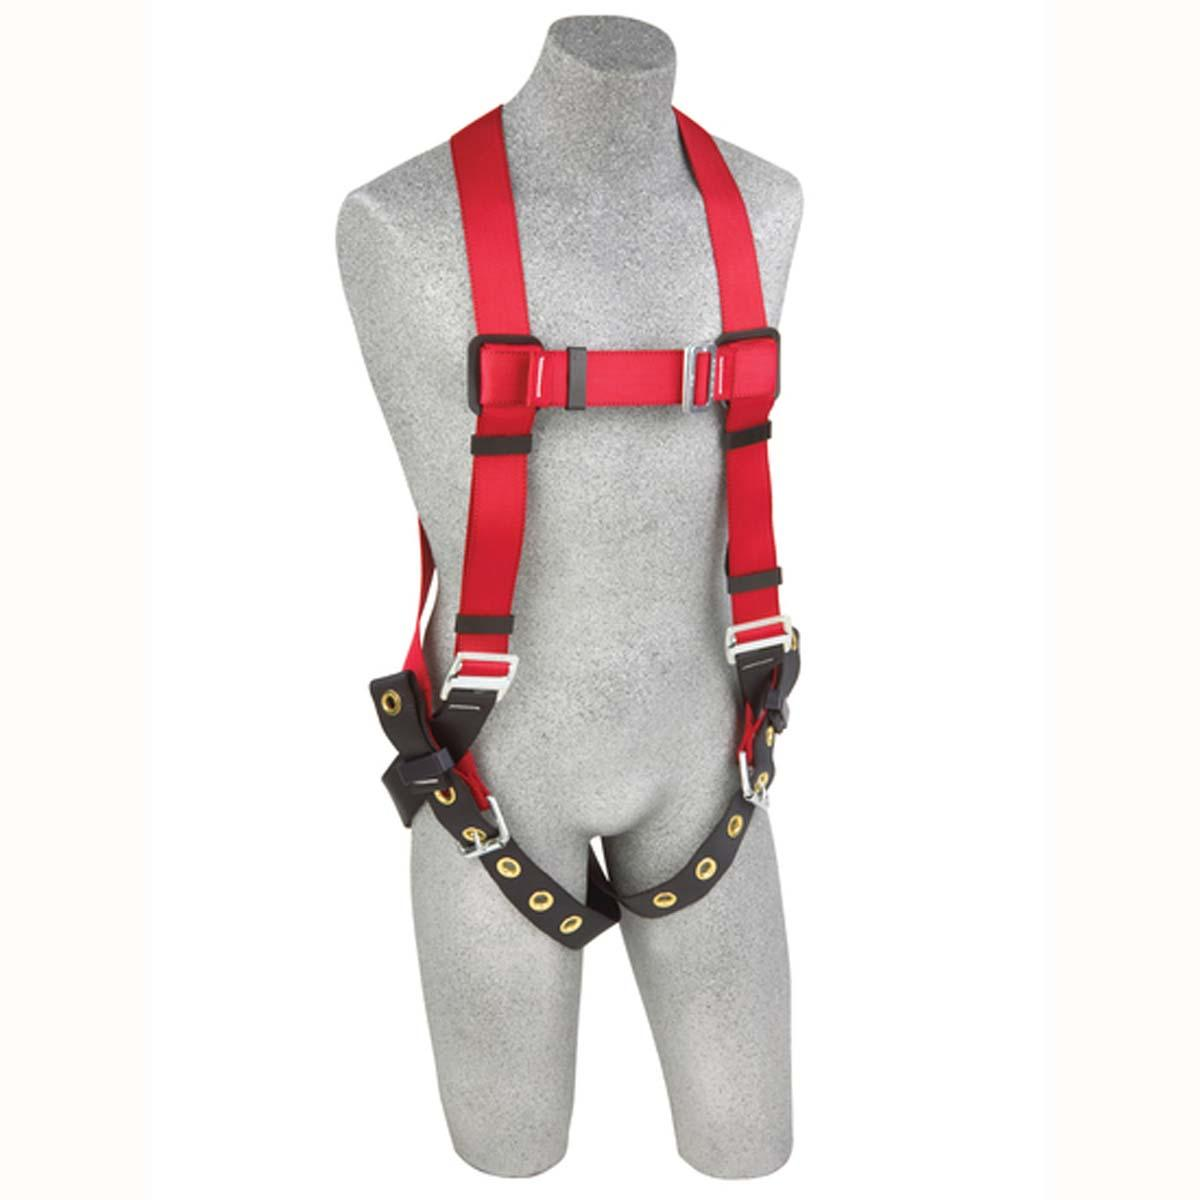 "PROâ""¢ Vest-Style Harness"